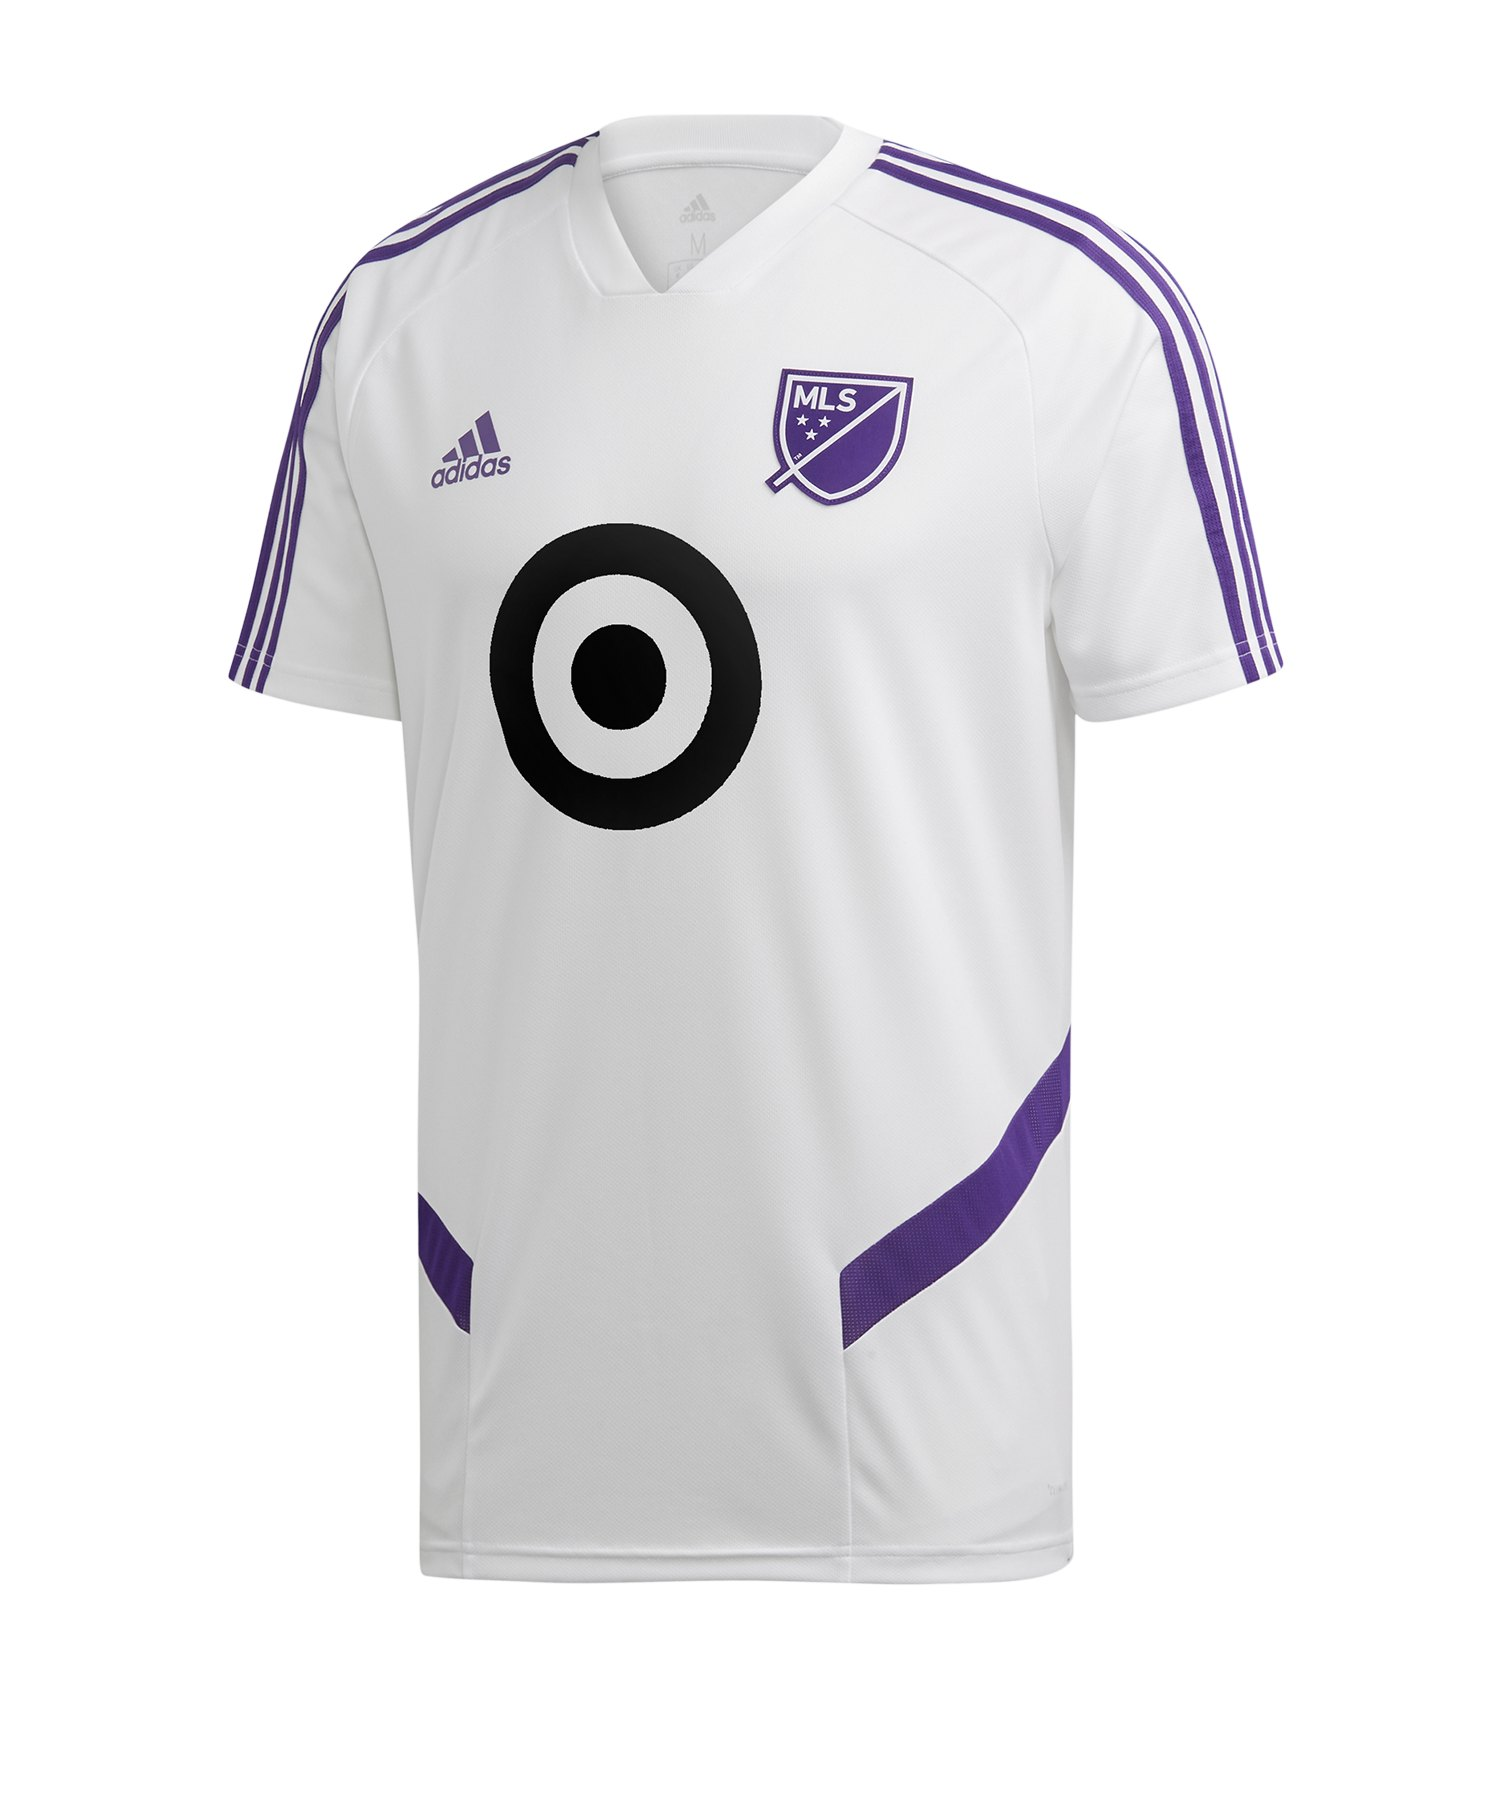 adidas MLS All Star Trainingsshirt Weiss   Fußball   Major